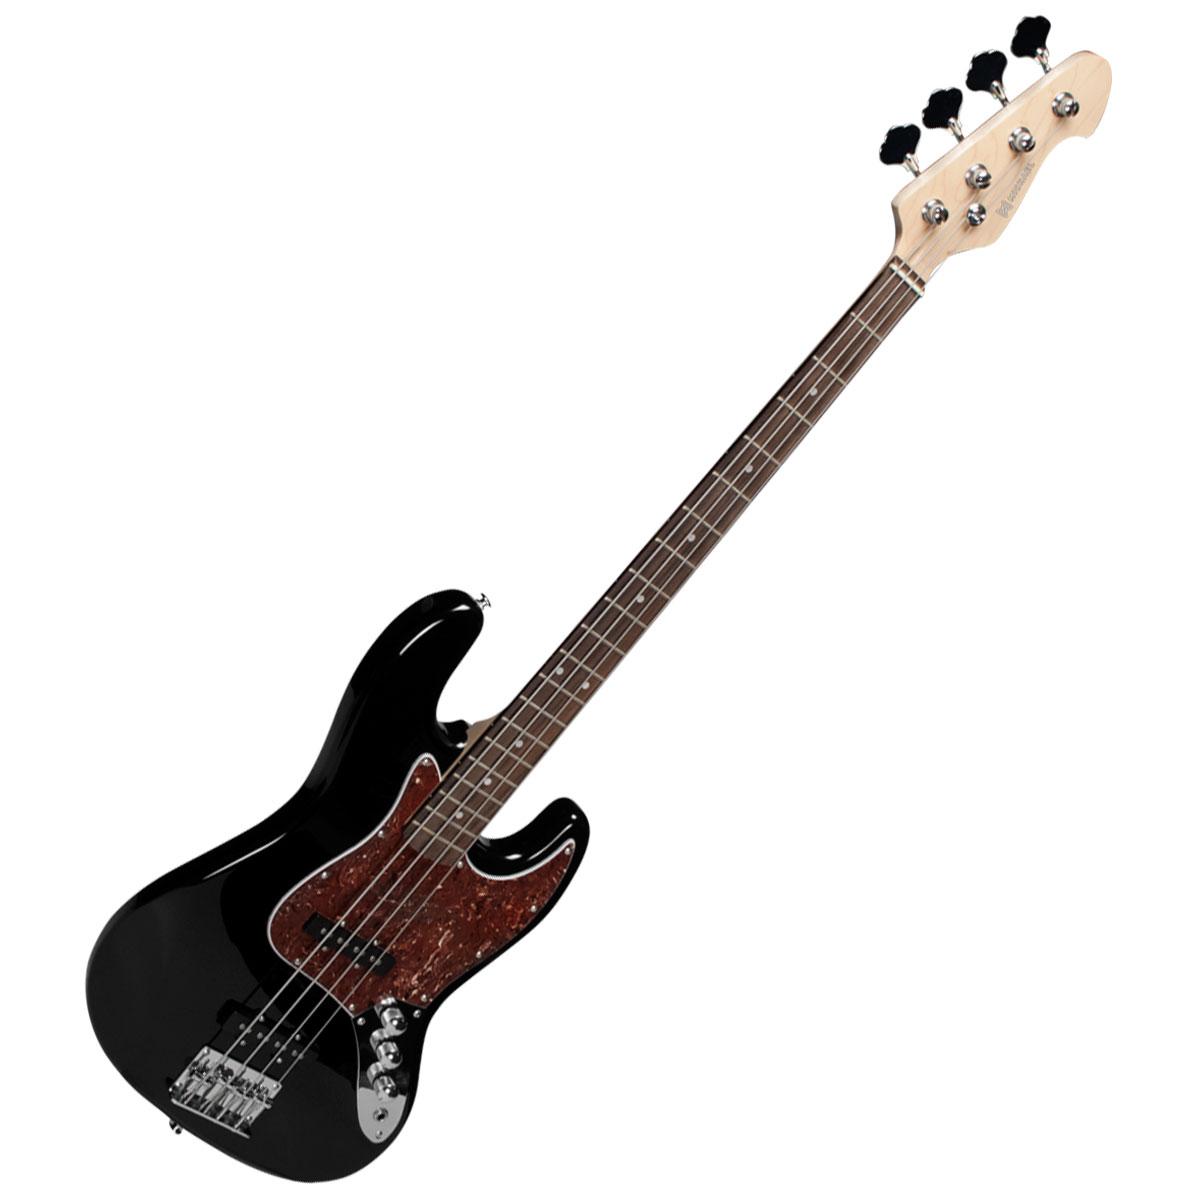 Contrabaixo 4 Cordas Passivo Jazz Bass BM607 BT Black Tortoise - Michael